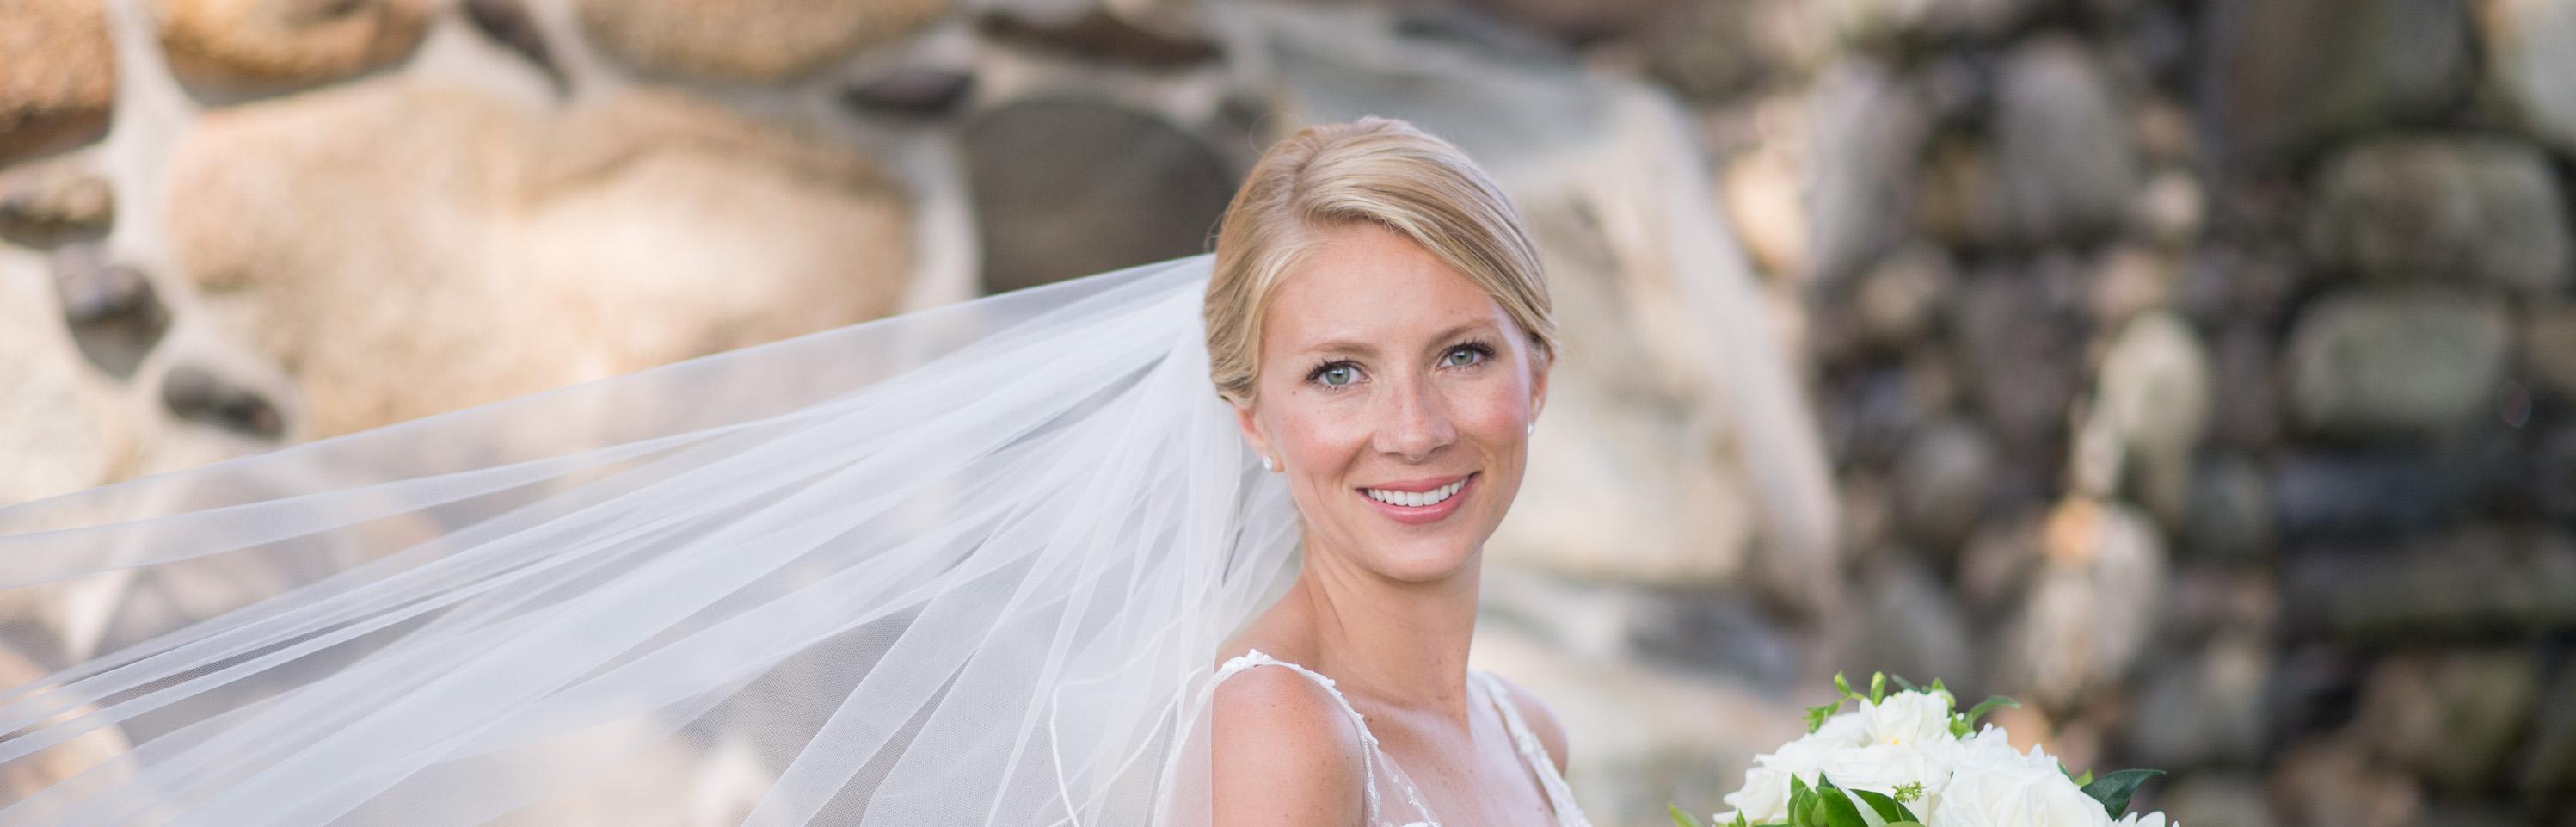 bride banner image